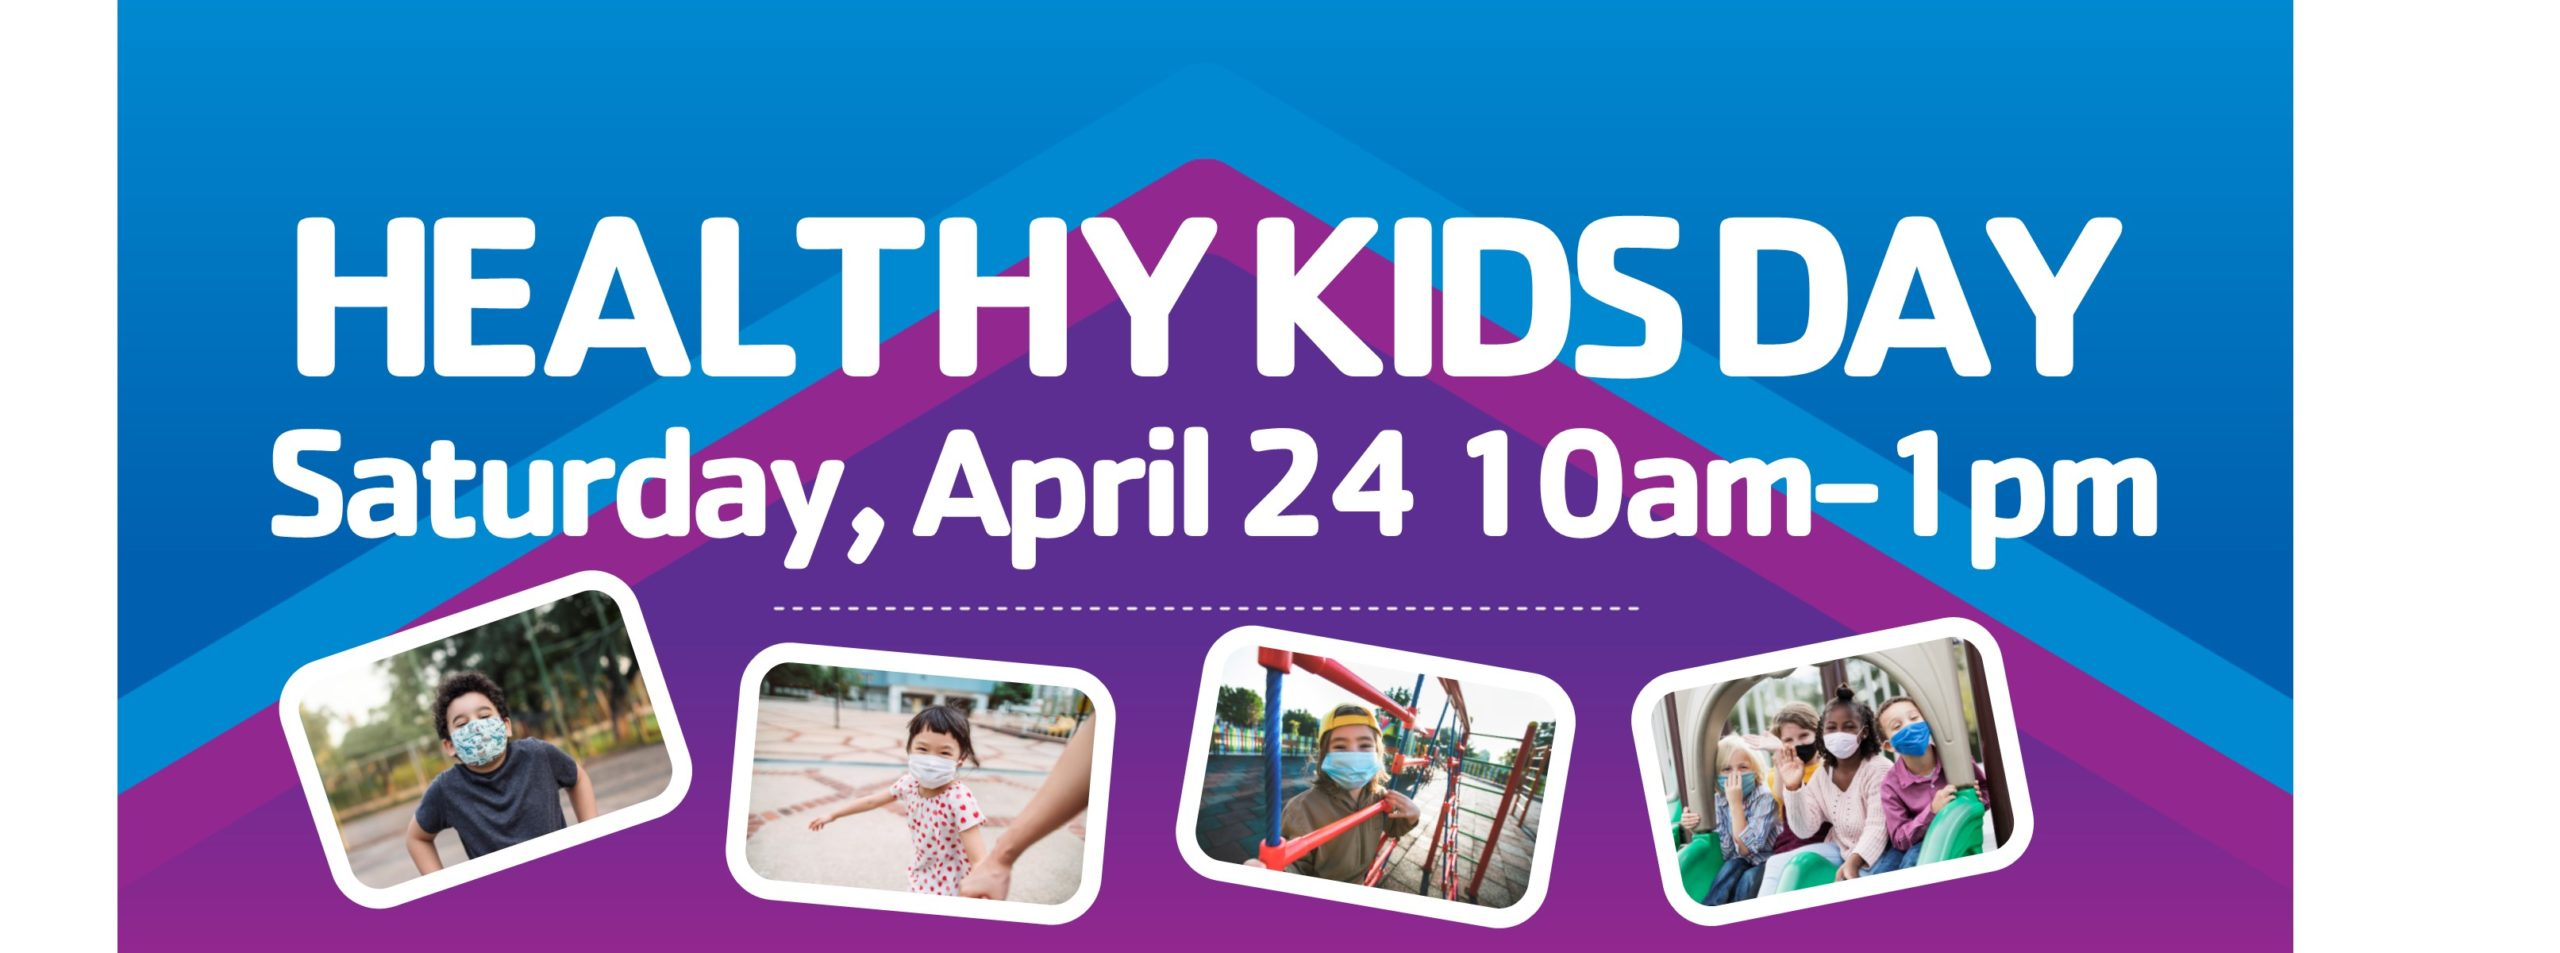 Healthy Kids Day, April 24 2021